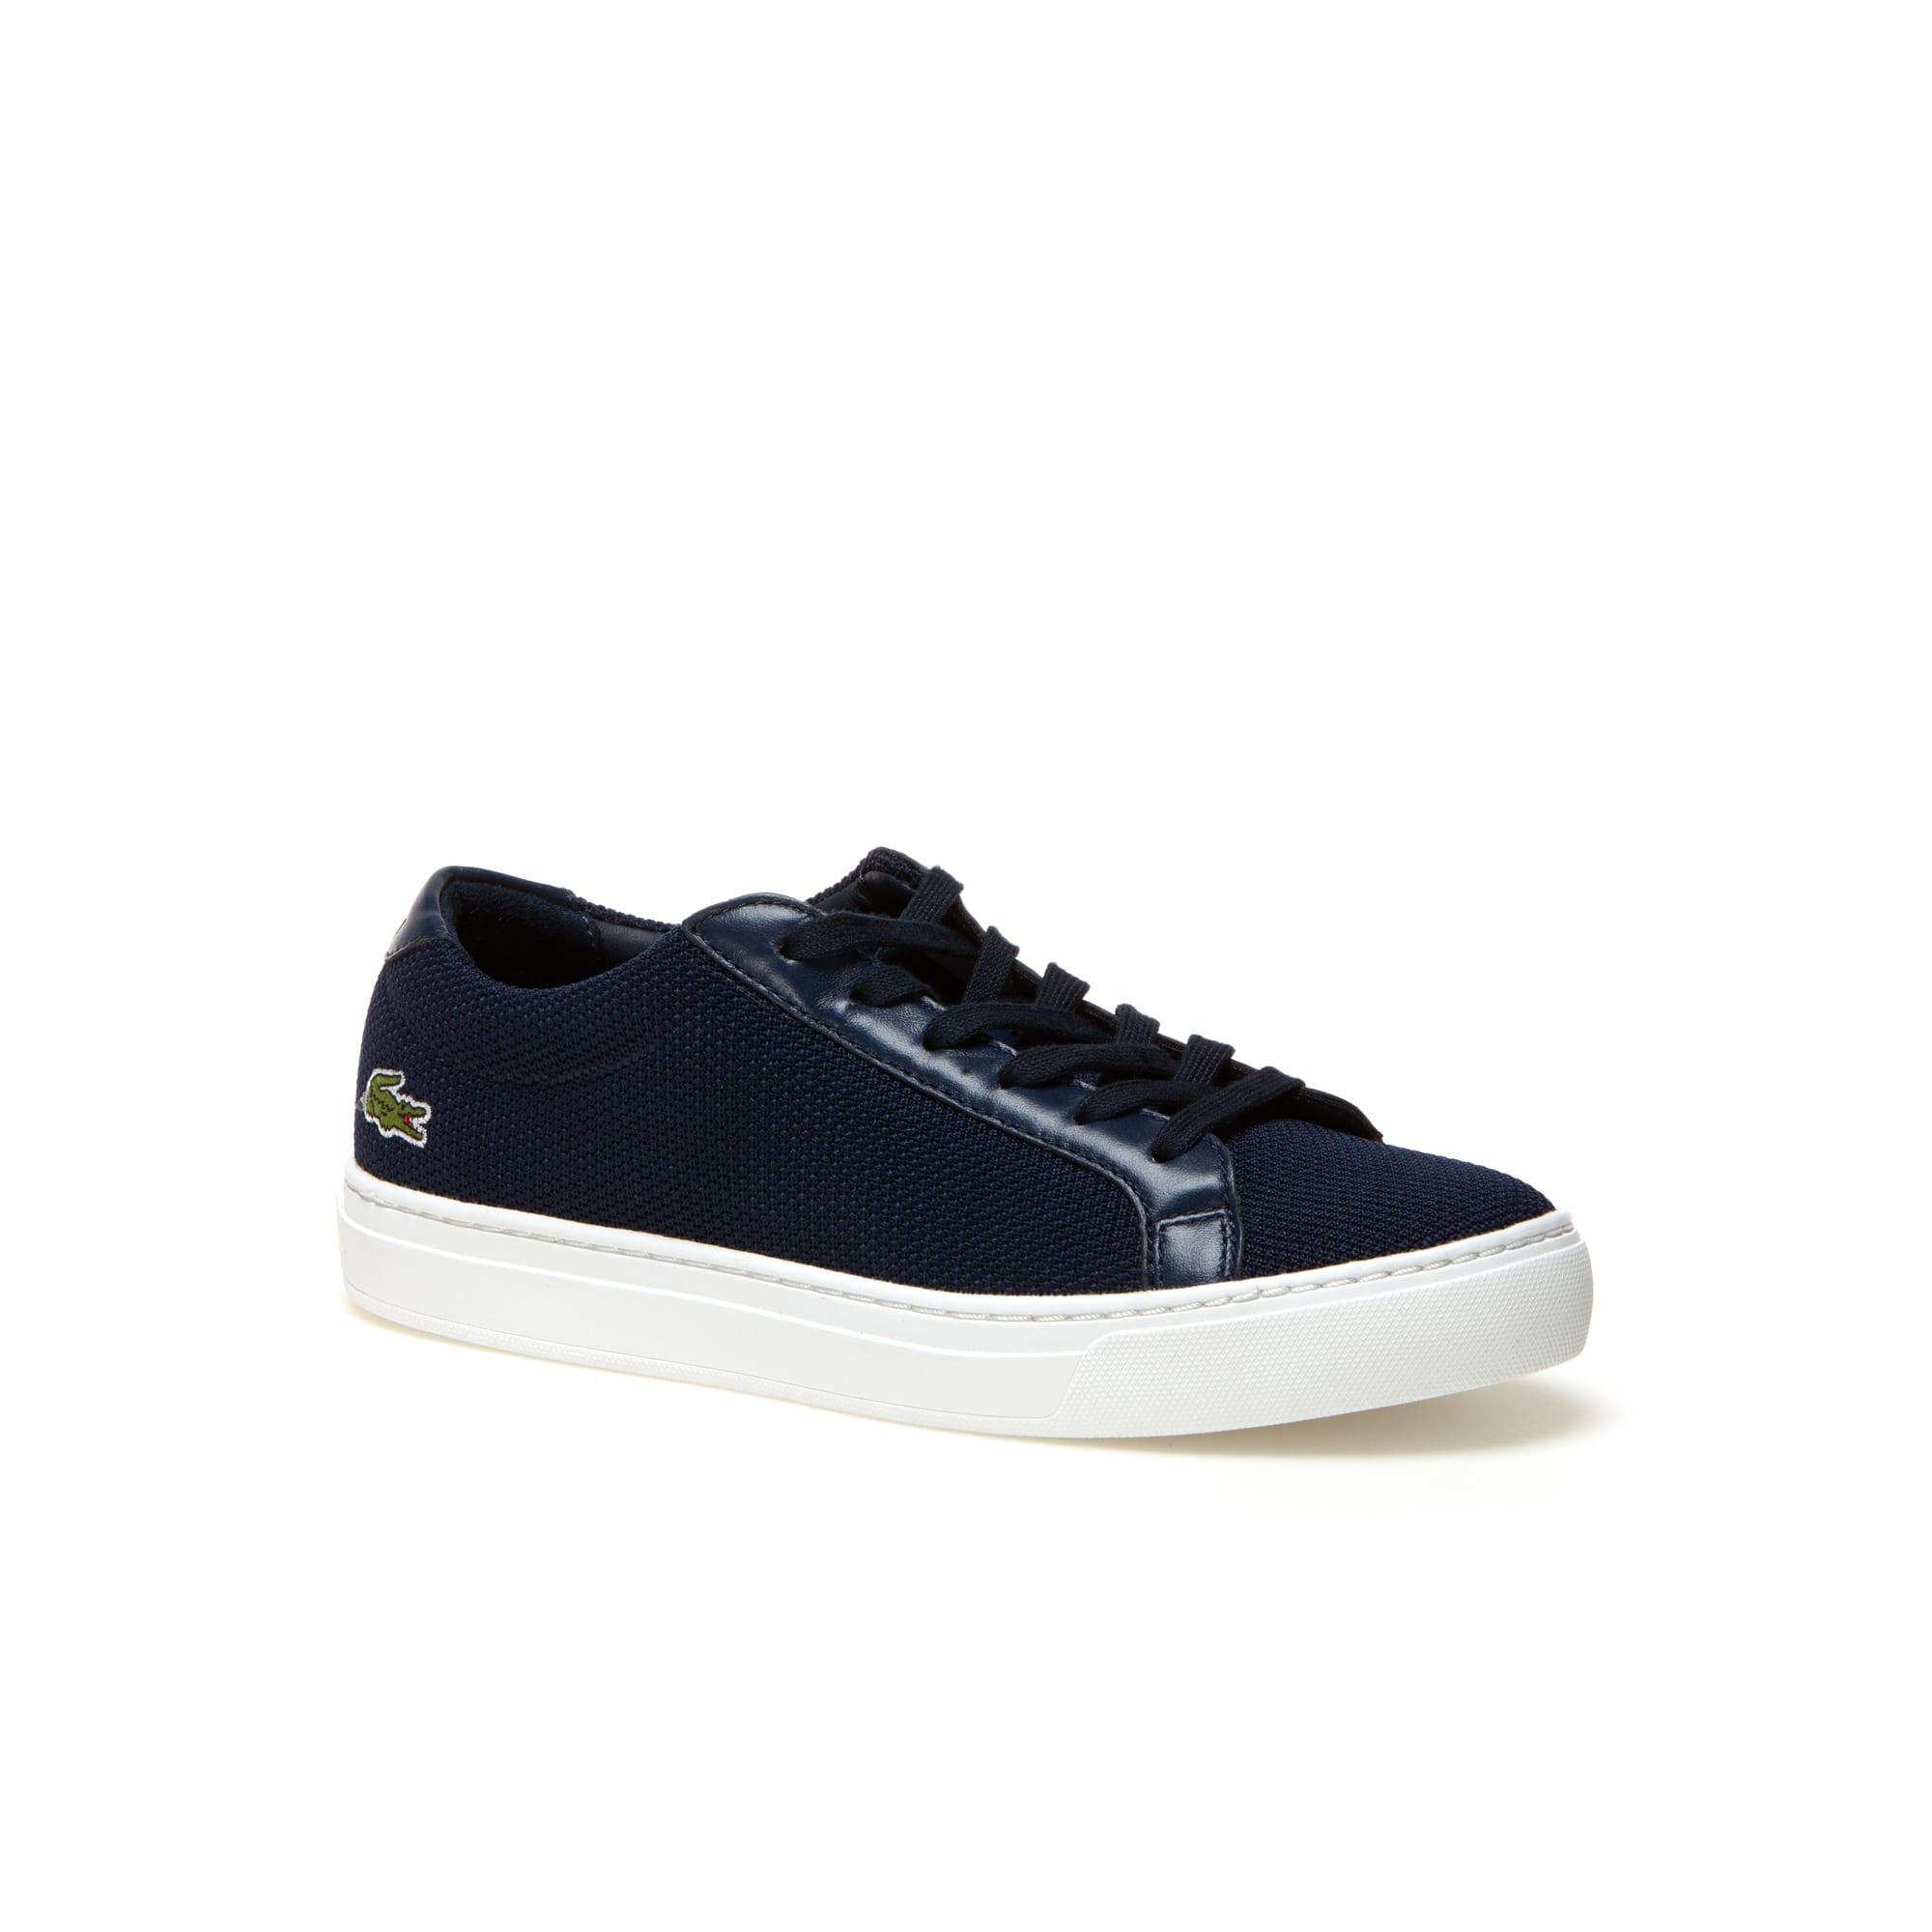 9648af643 Shoes for Women | Footwear | LACOSTE